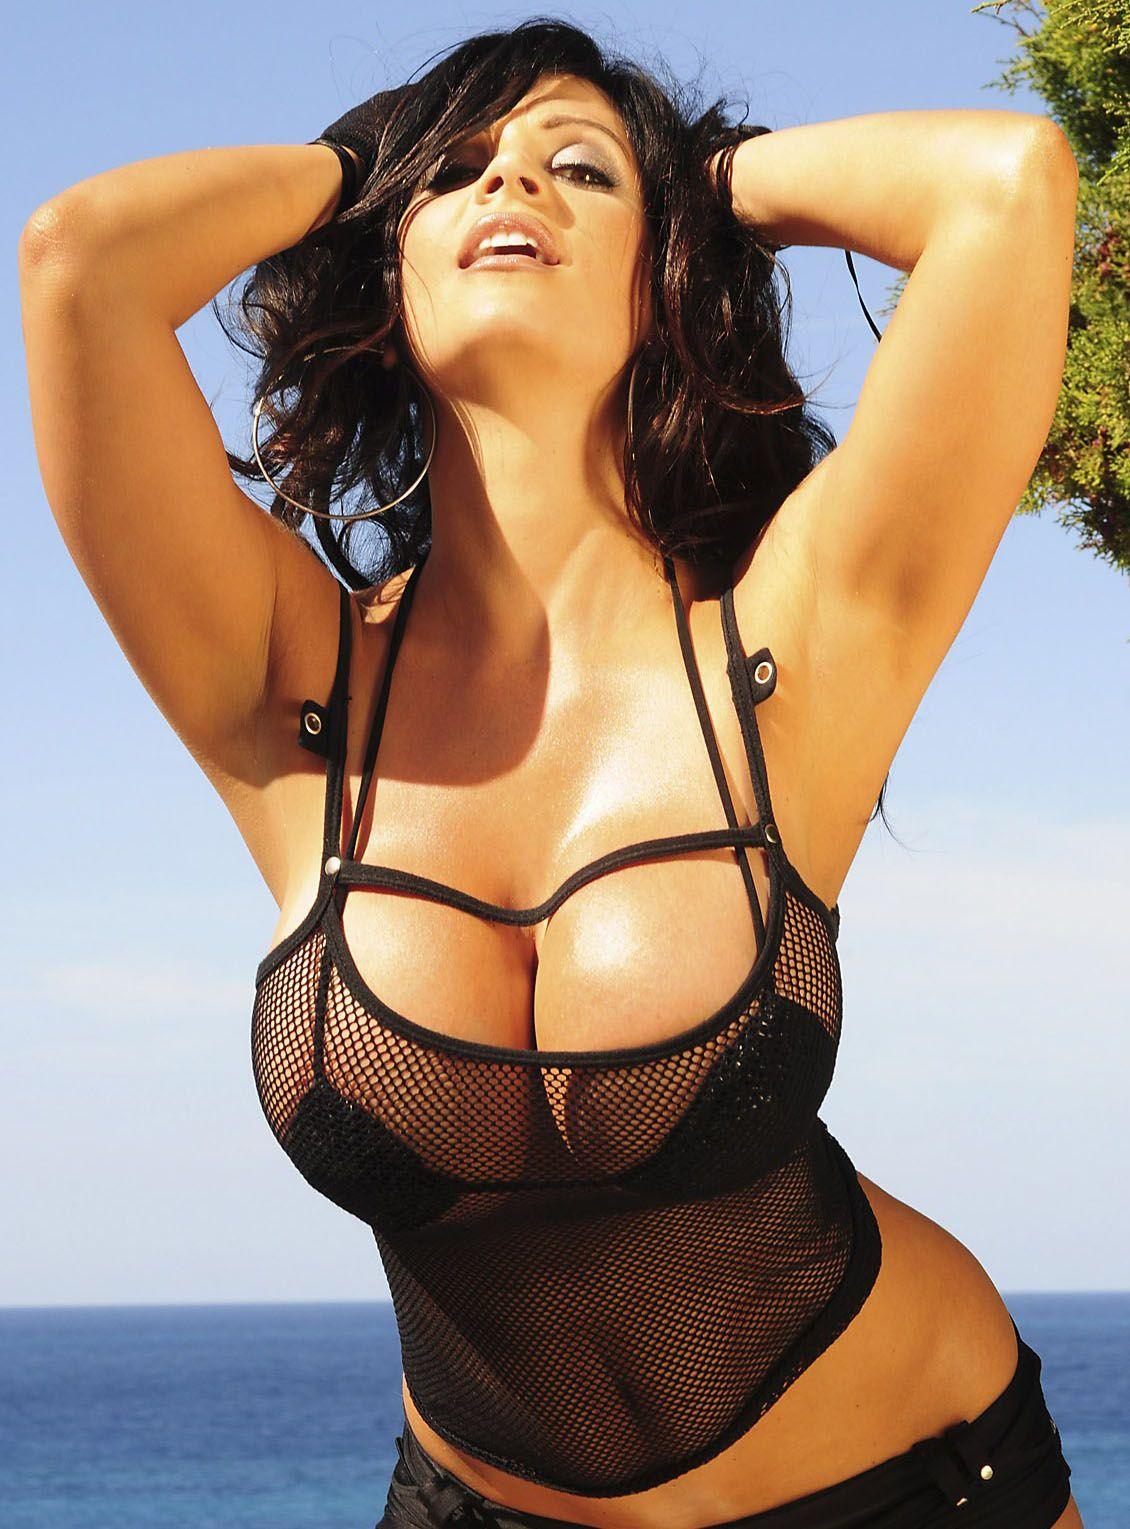 denis milani has hottttt curves!